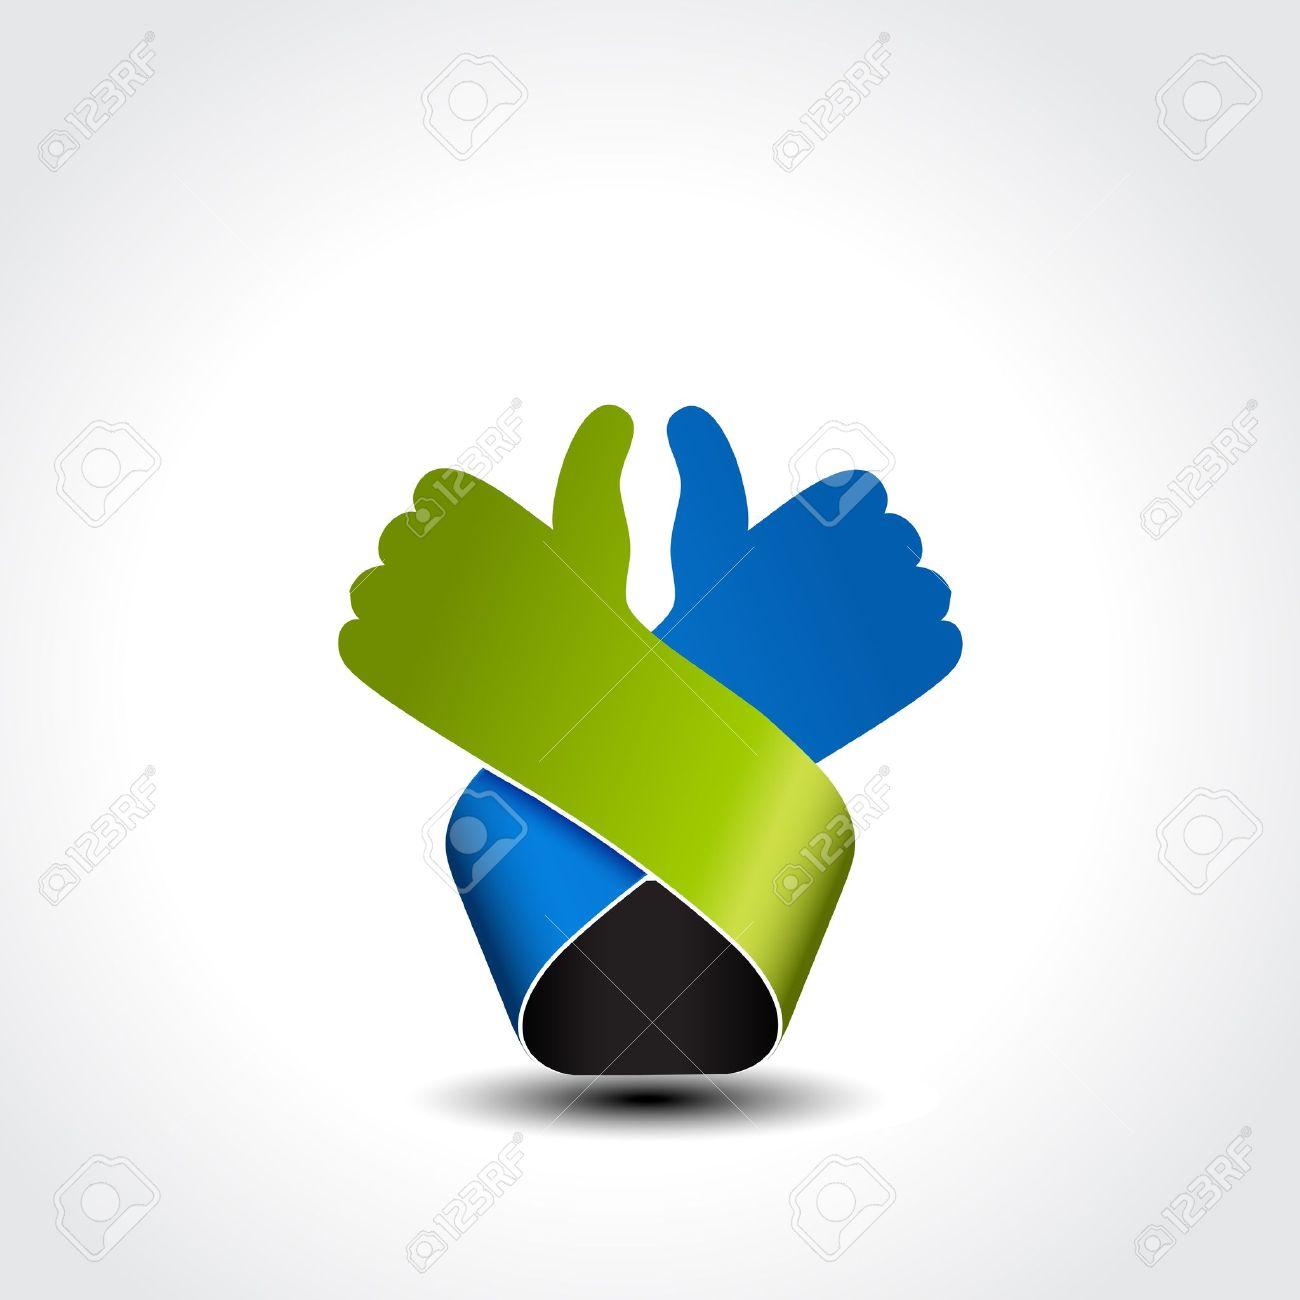 best choice symbol - hand gesture - illustration - 19506232